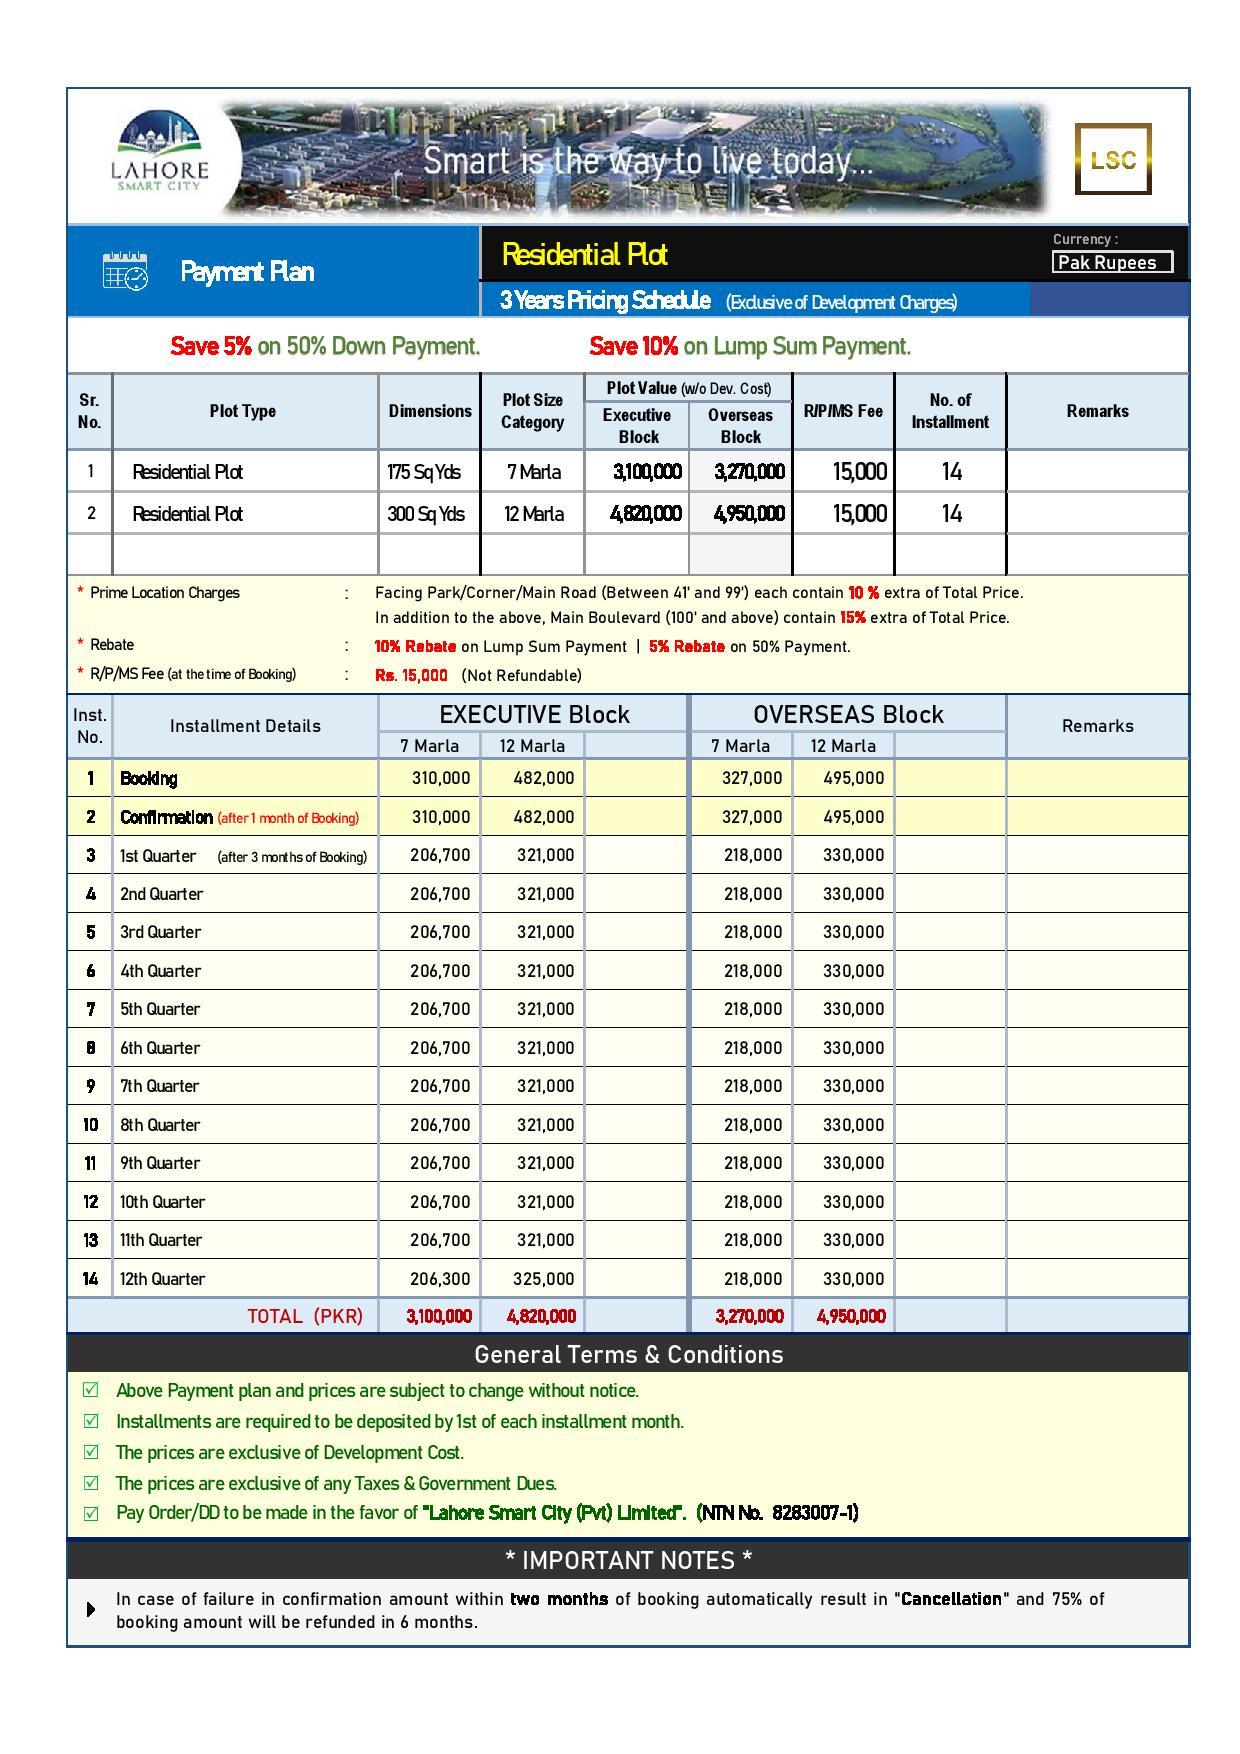 LSC-revised-Payment-Plan-7-12-Marla.jpg